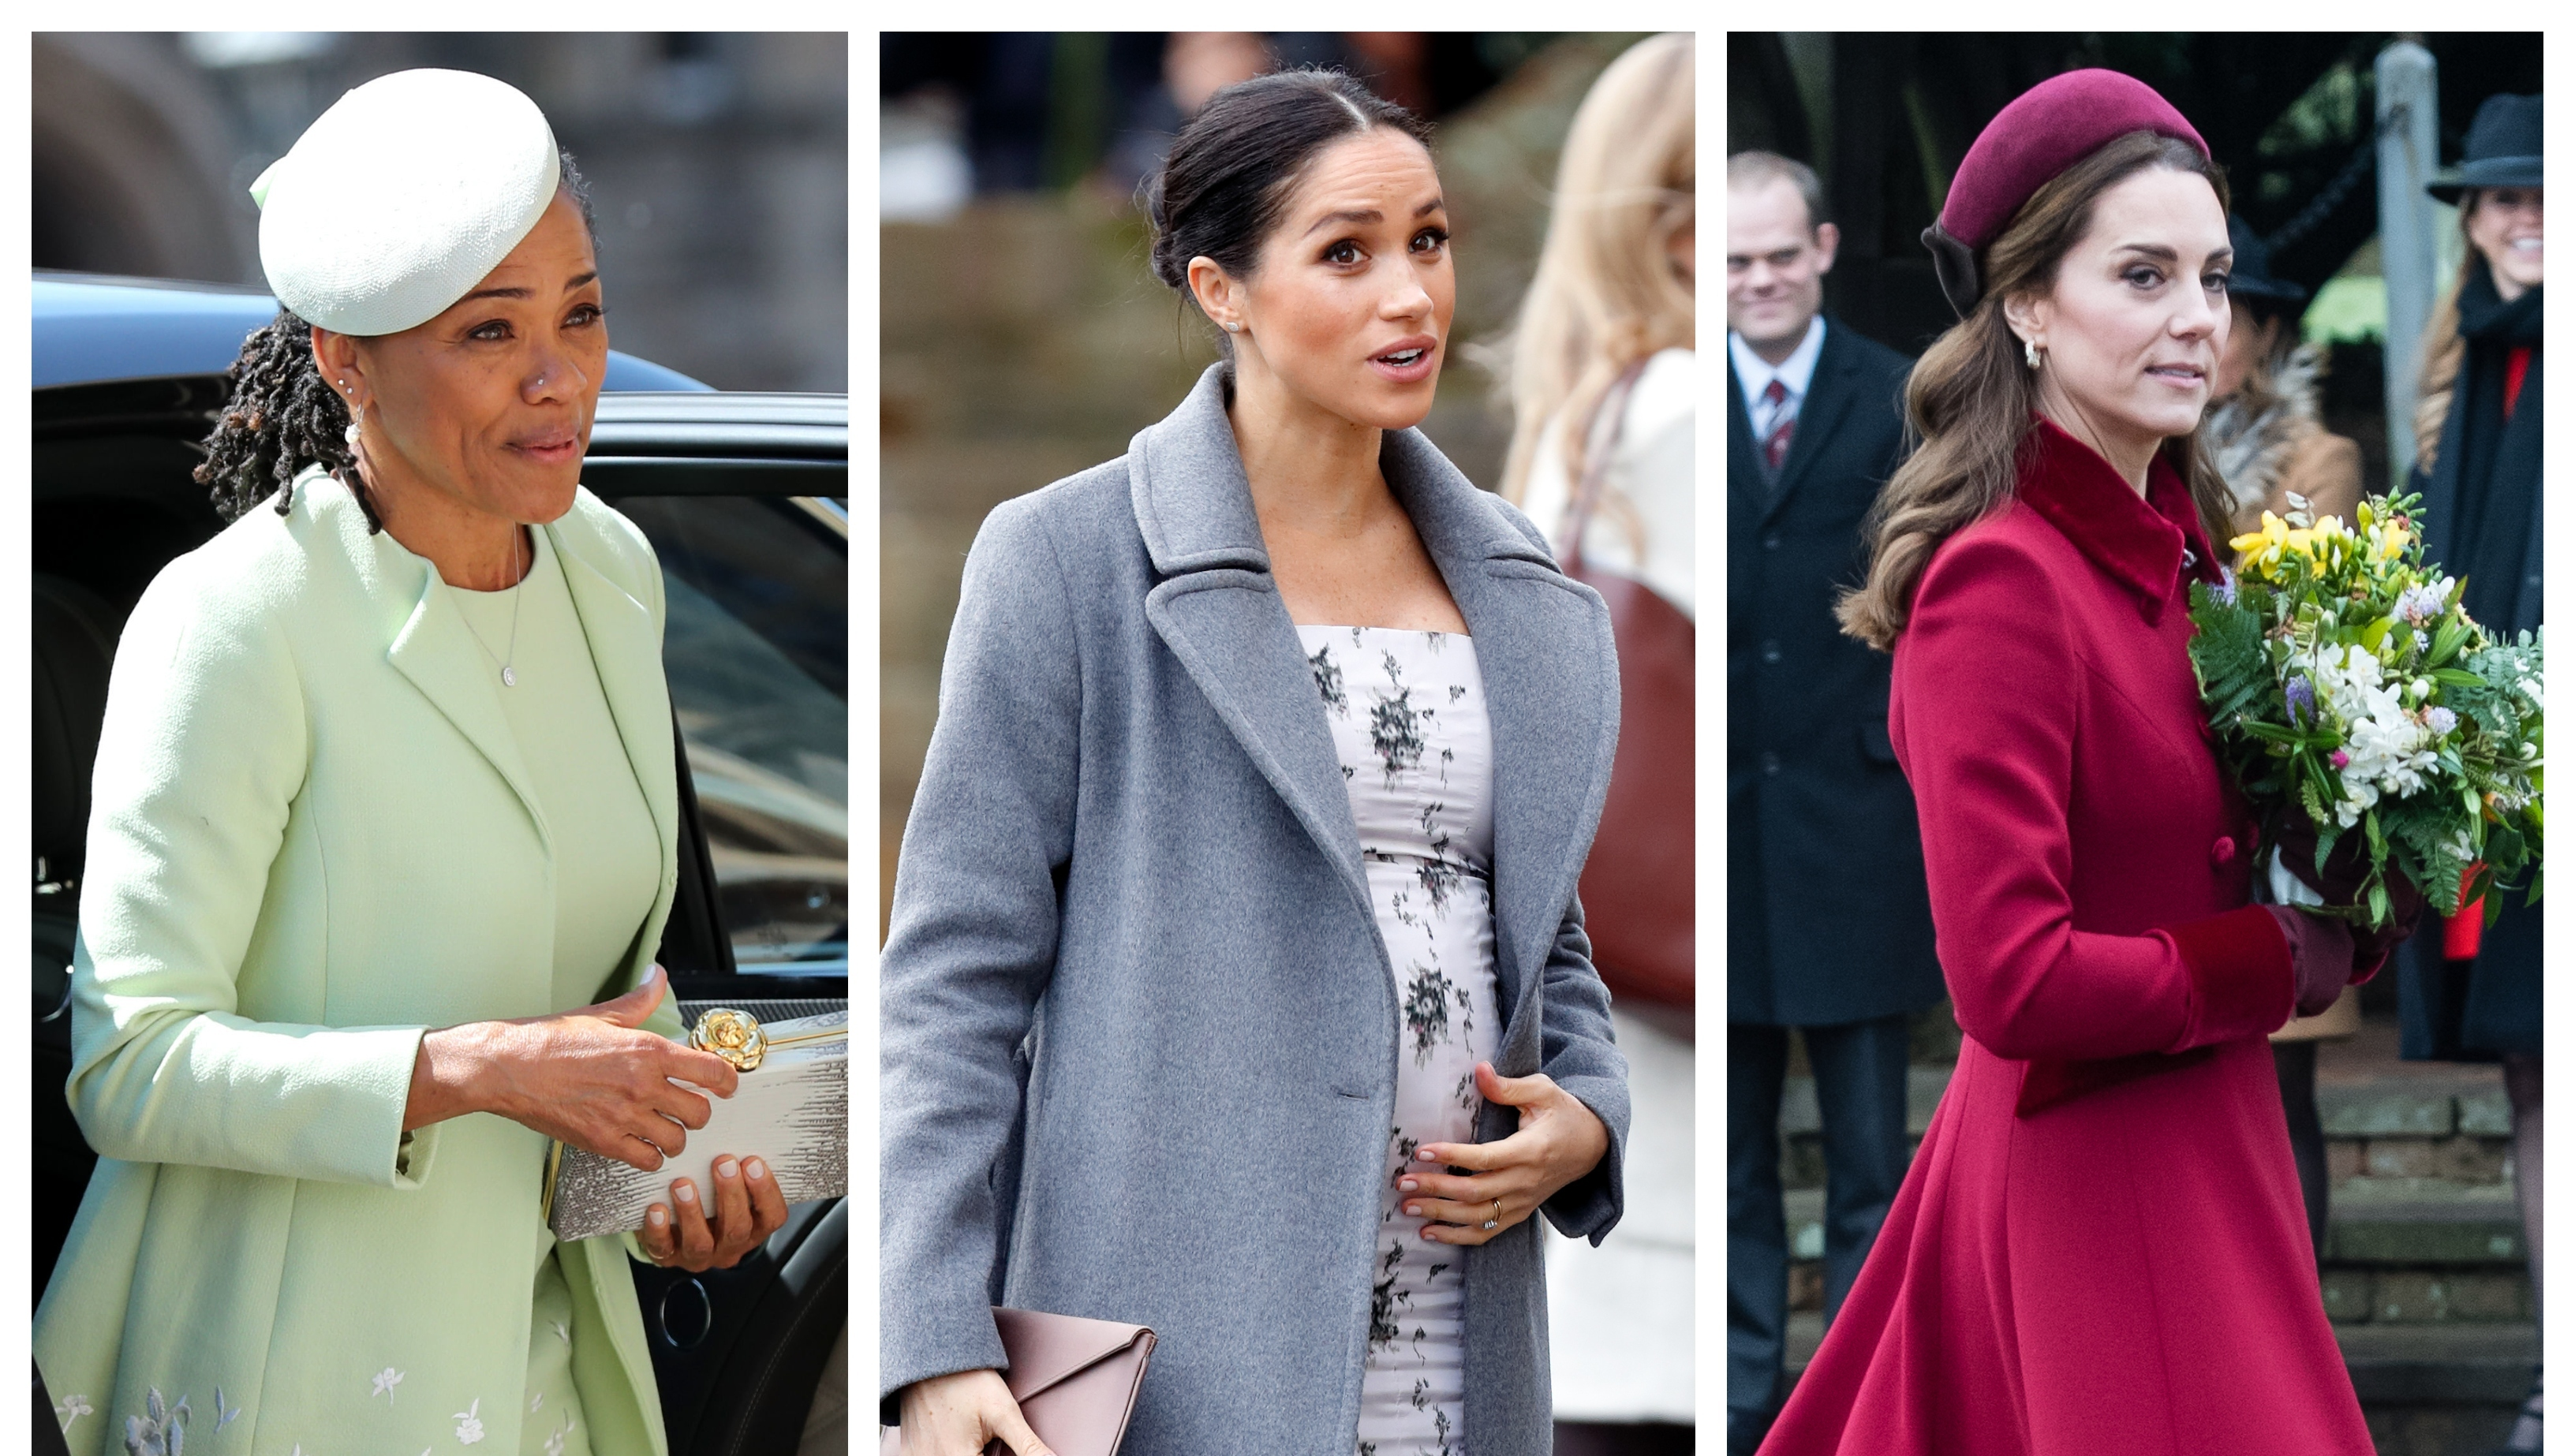 Doria Ragland, Green Dress, Meghan Markle, Pregnant, Kate Middleton, Red Coat, Split Image